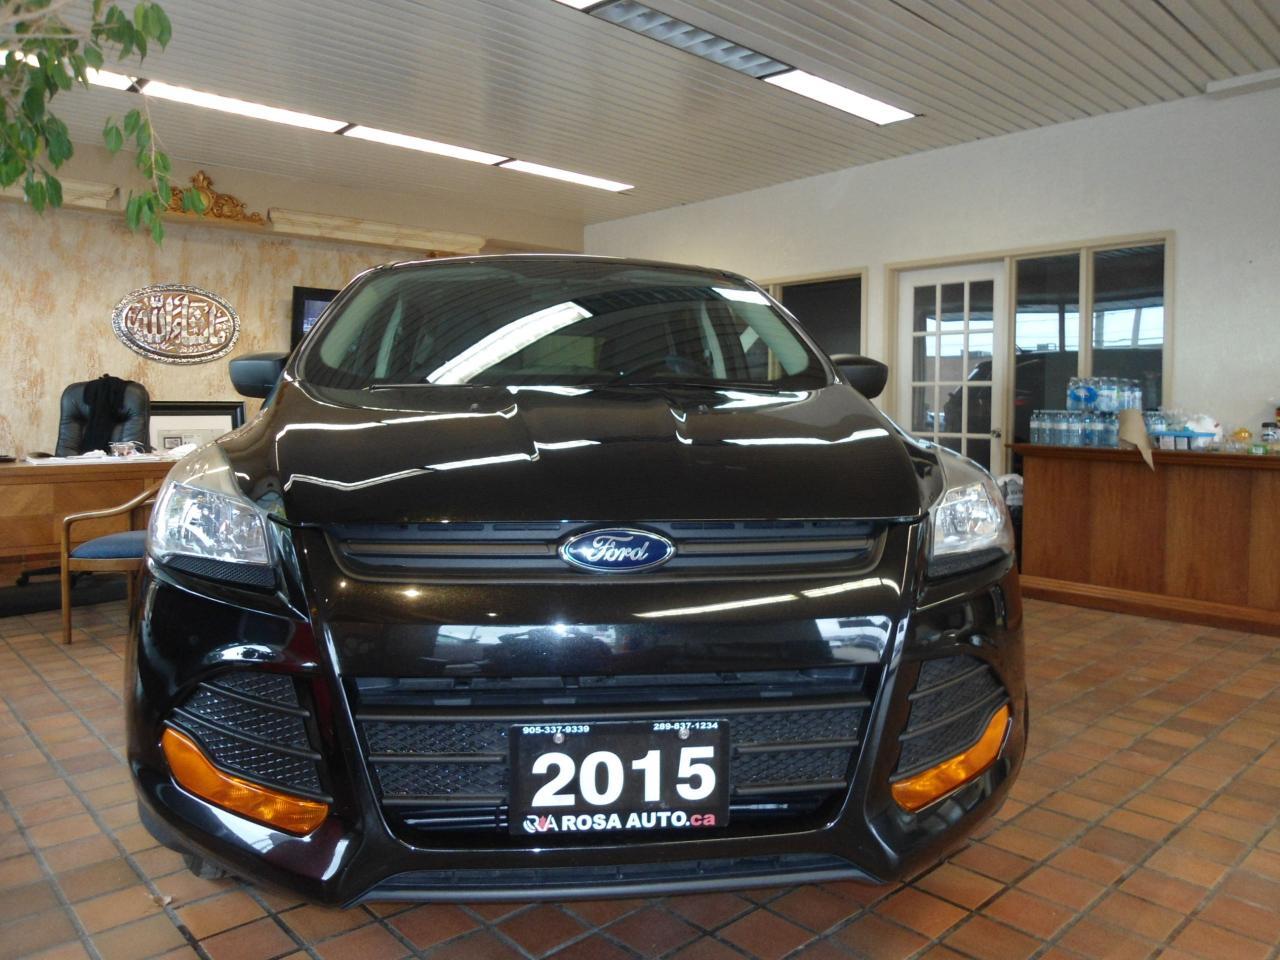 2015 Ford Escape Auto, ONE OWNER, NO ACCIDENT,LOW KM, AUX, MICHELIN